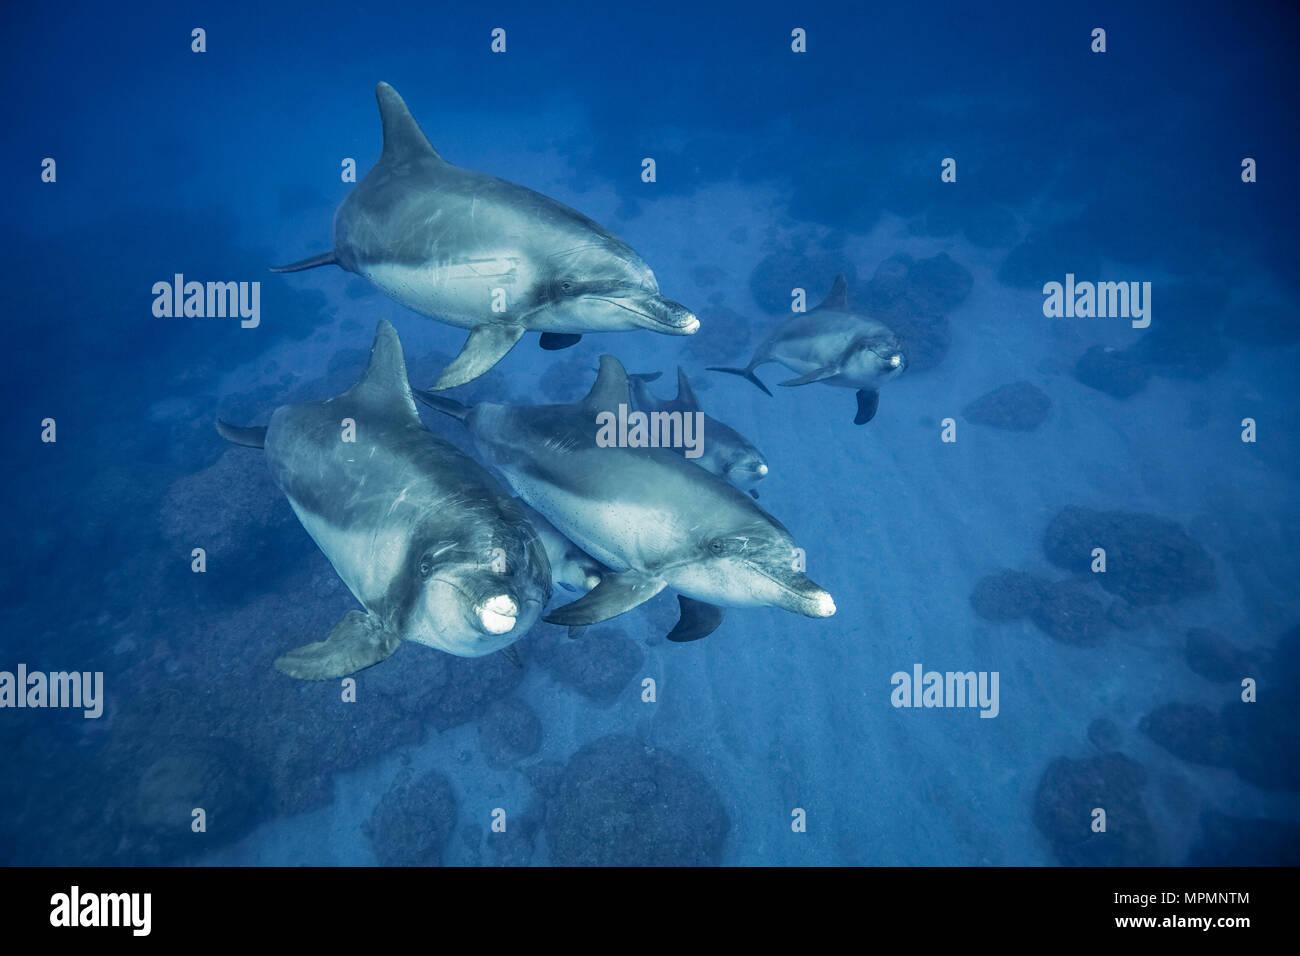 Indo-Pacific bottlenose dolphin, Tursiops aduncus, Chichi-jima, Bonin Islands, Ogasawara Islands, Japan, Pacific Ocean - Stock Image